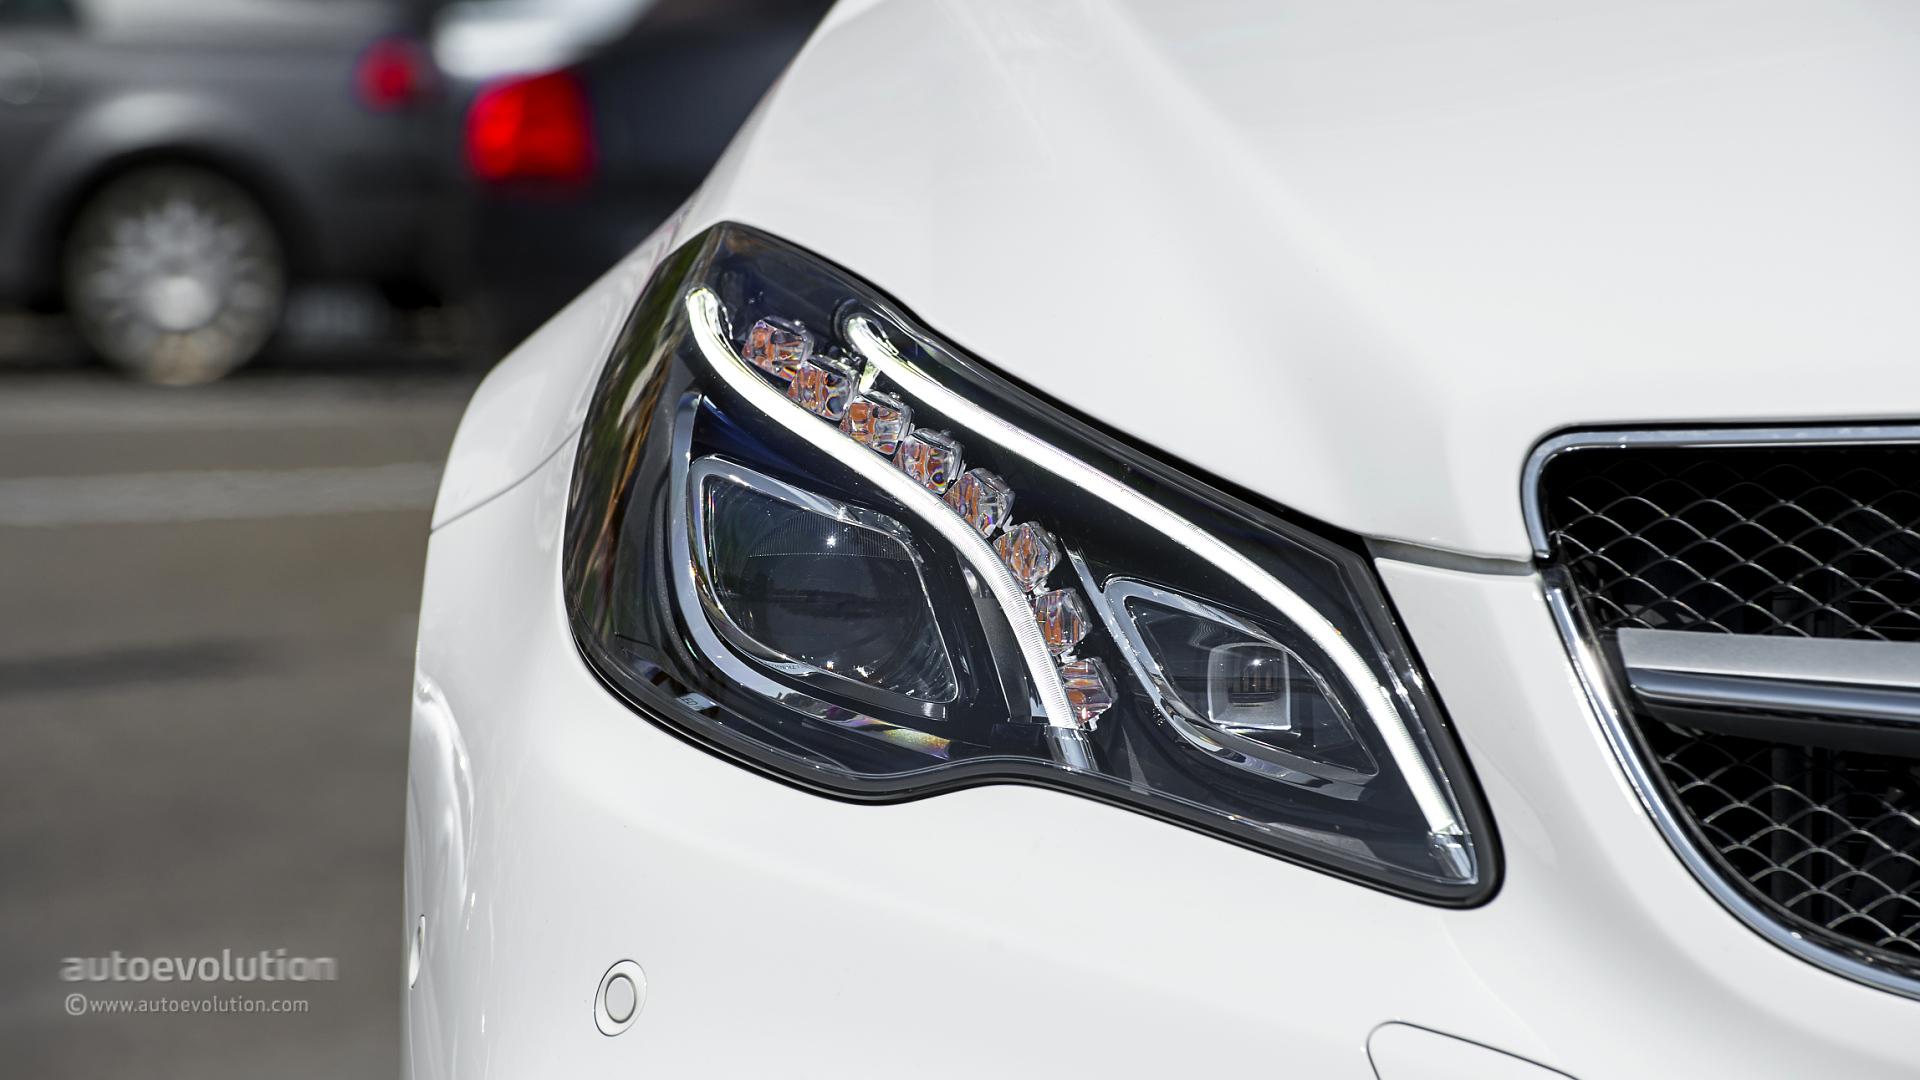 2014 mercedes benz e class cabriolet review autoevolution for Mercedes benz lights